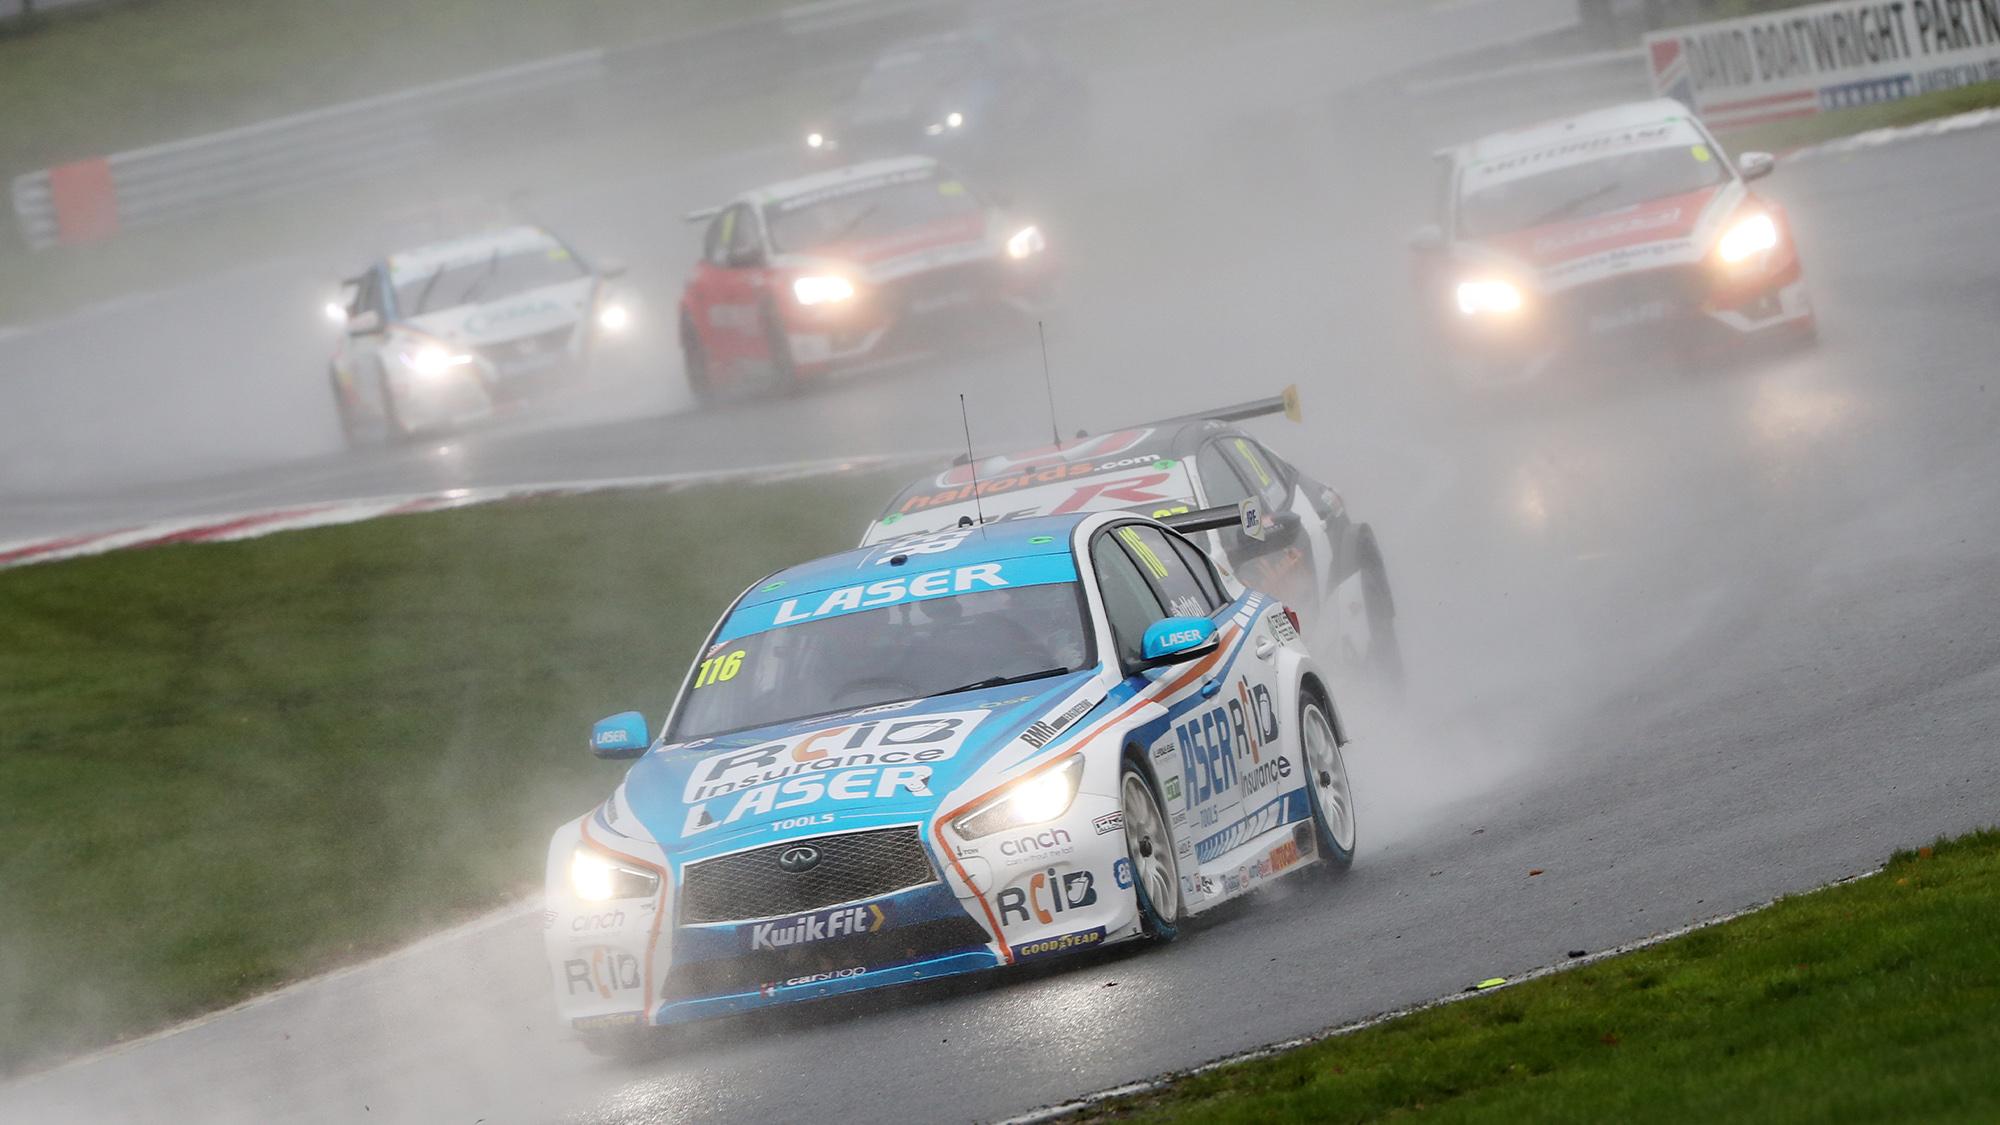 Ash Sutton leads in the rain at the 2020 BTCC Brands Hatch Indy round